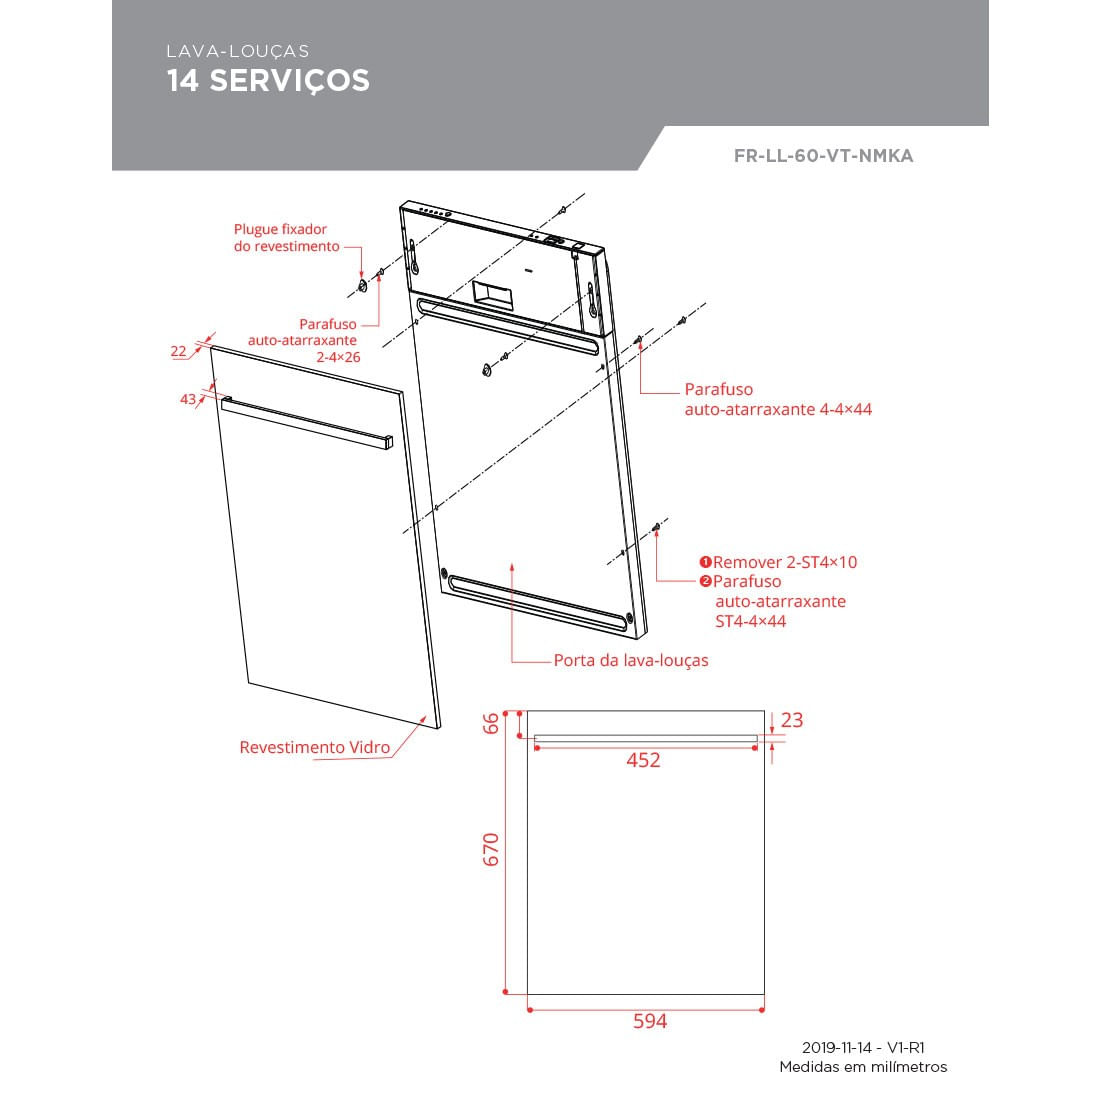 Porta para Lava-Louças Elettromec Vetro 14 Serviços Vidro Preto 60cm FR-LL-60-VT-NMKA